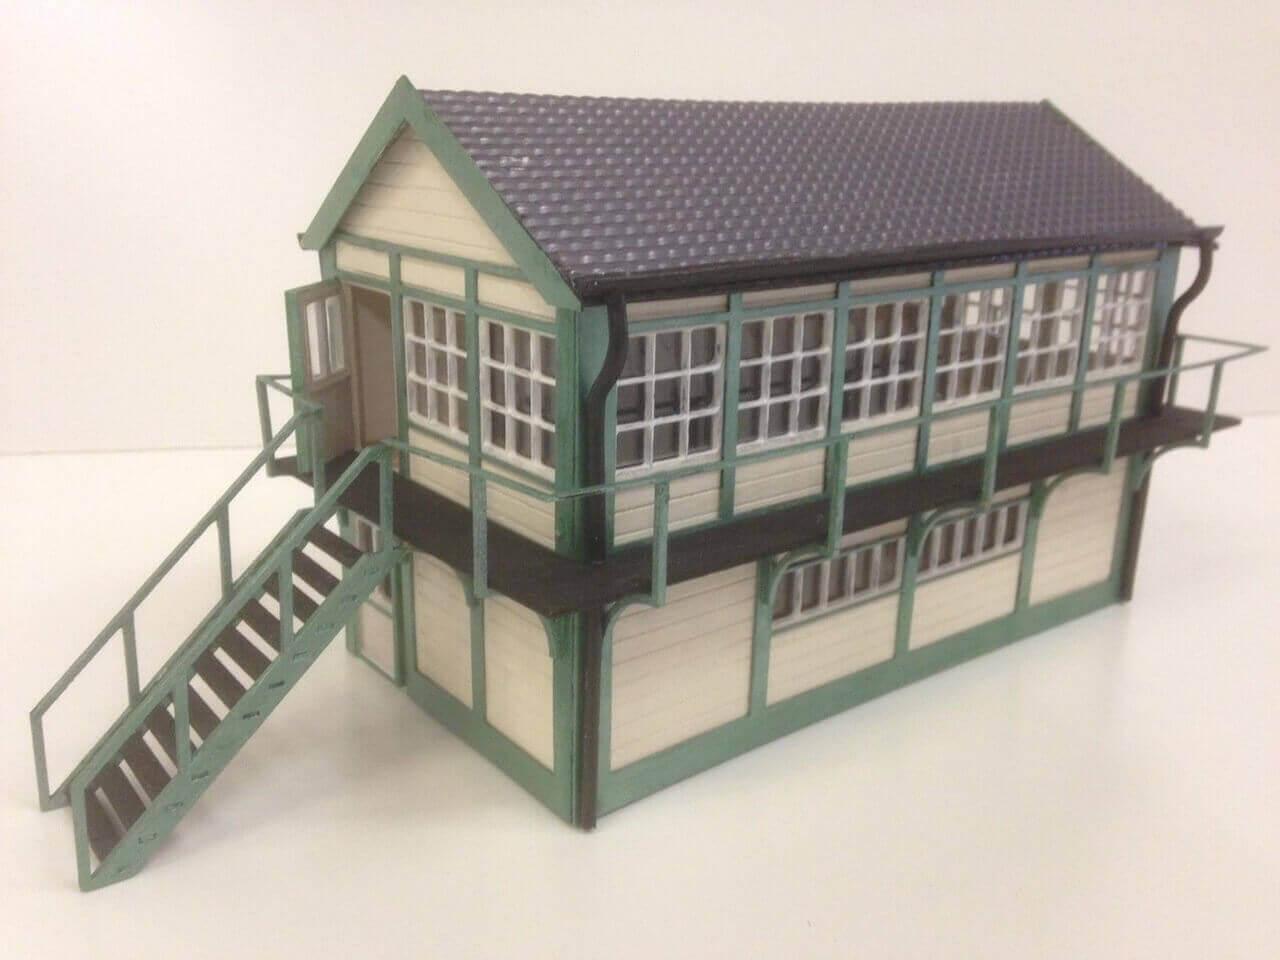 Accessories O Gauge Buildings : Buy model o gauge kits plastic sarik hobbies for the